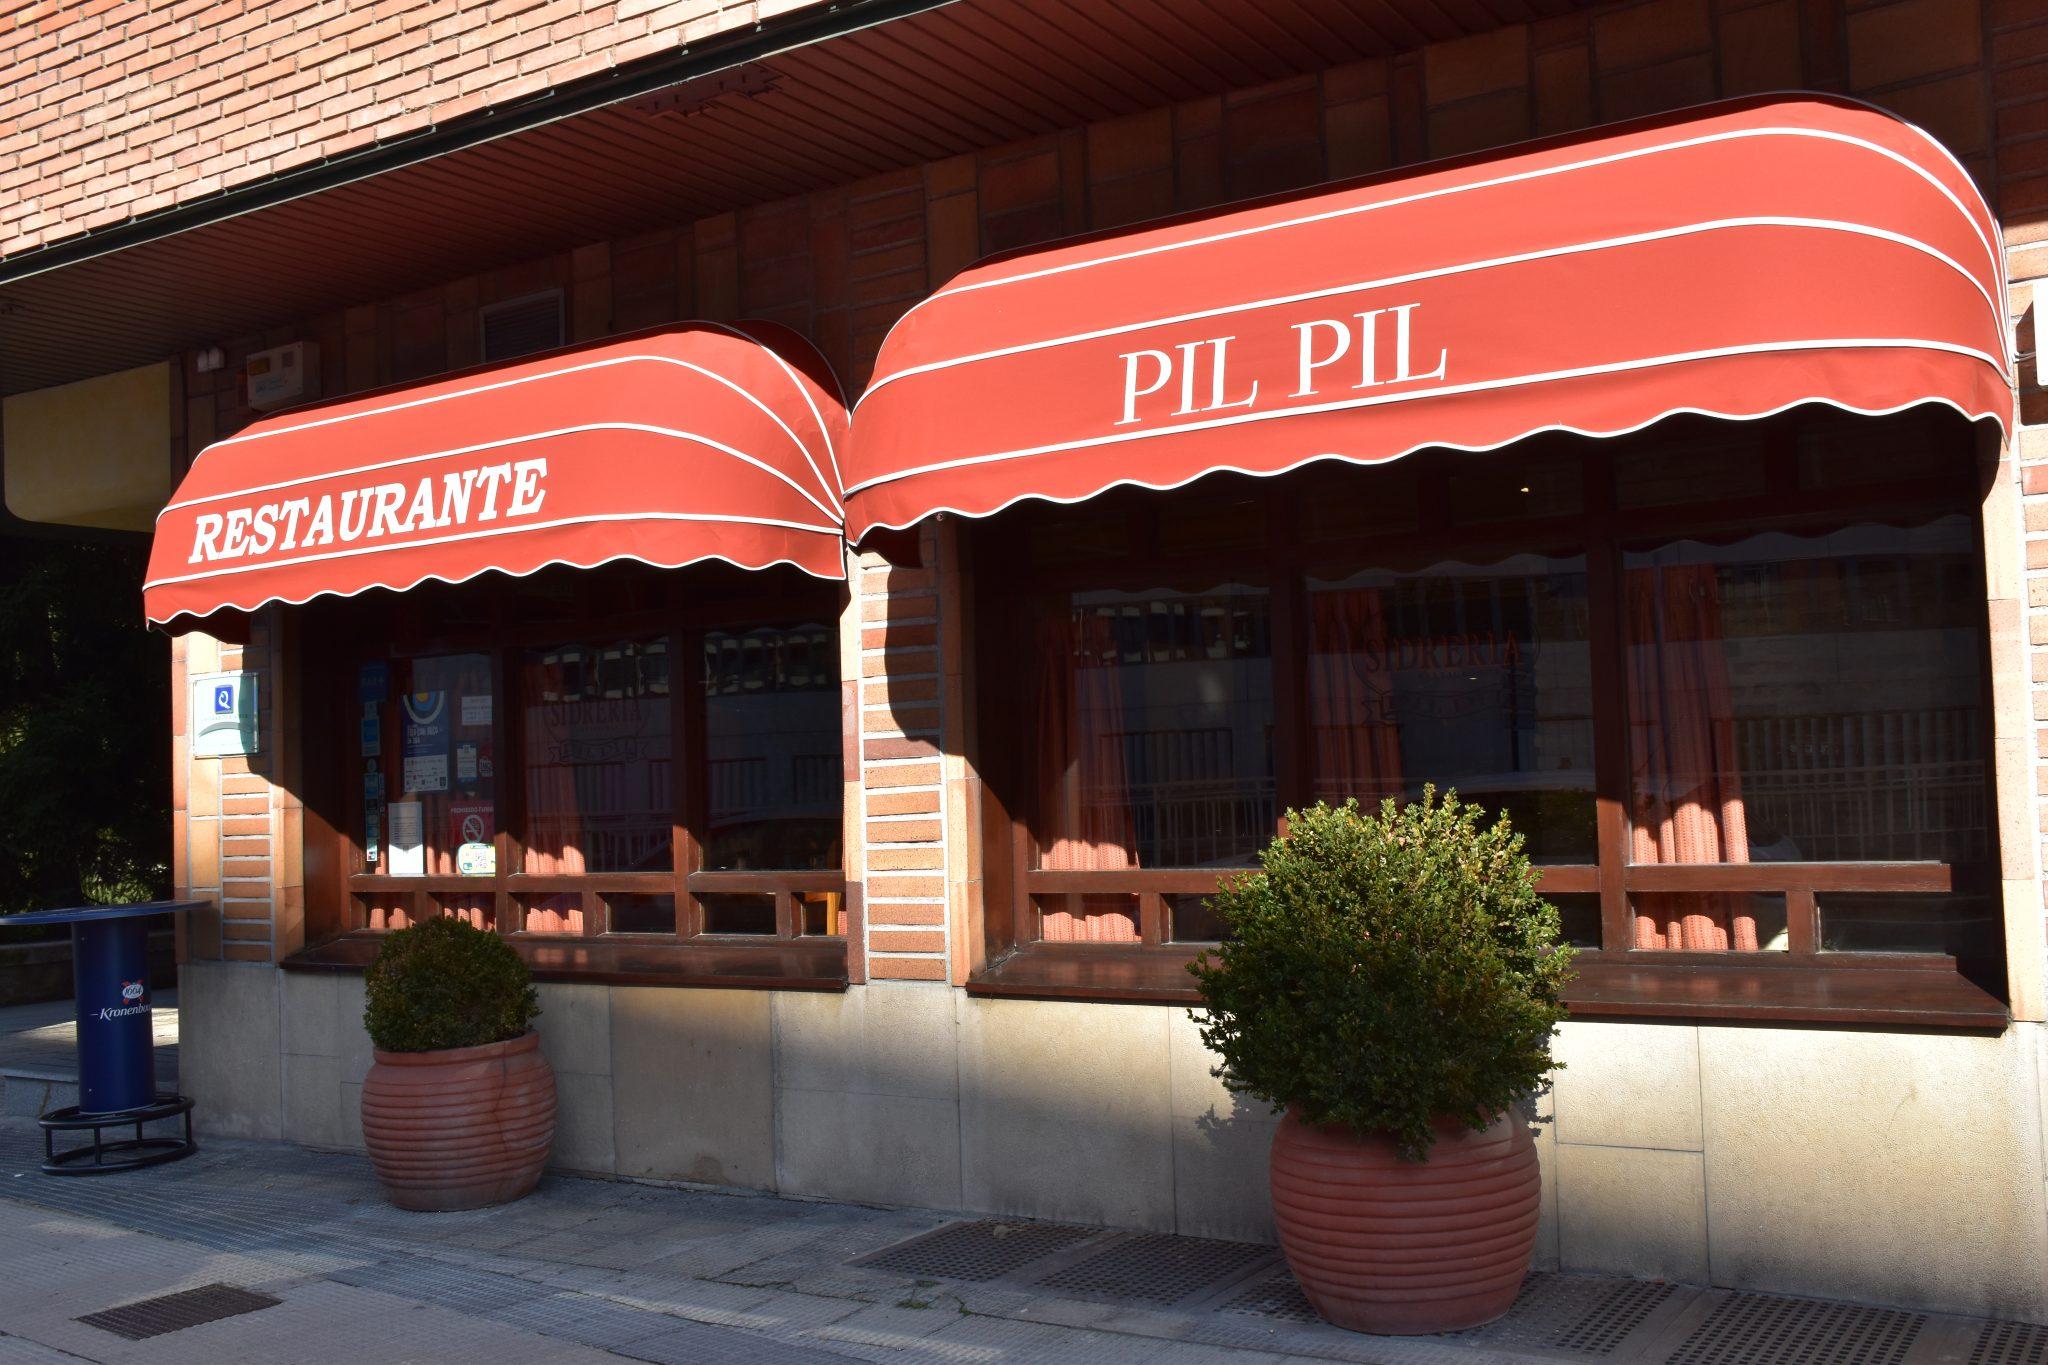 Fachada Restaurante Pil-Pil en Pamplona